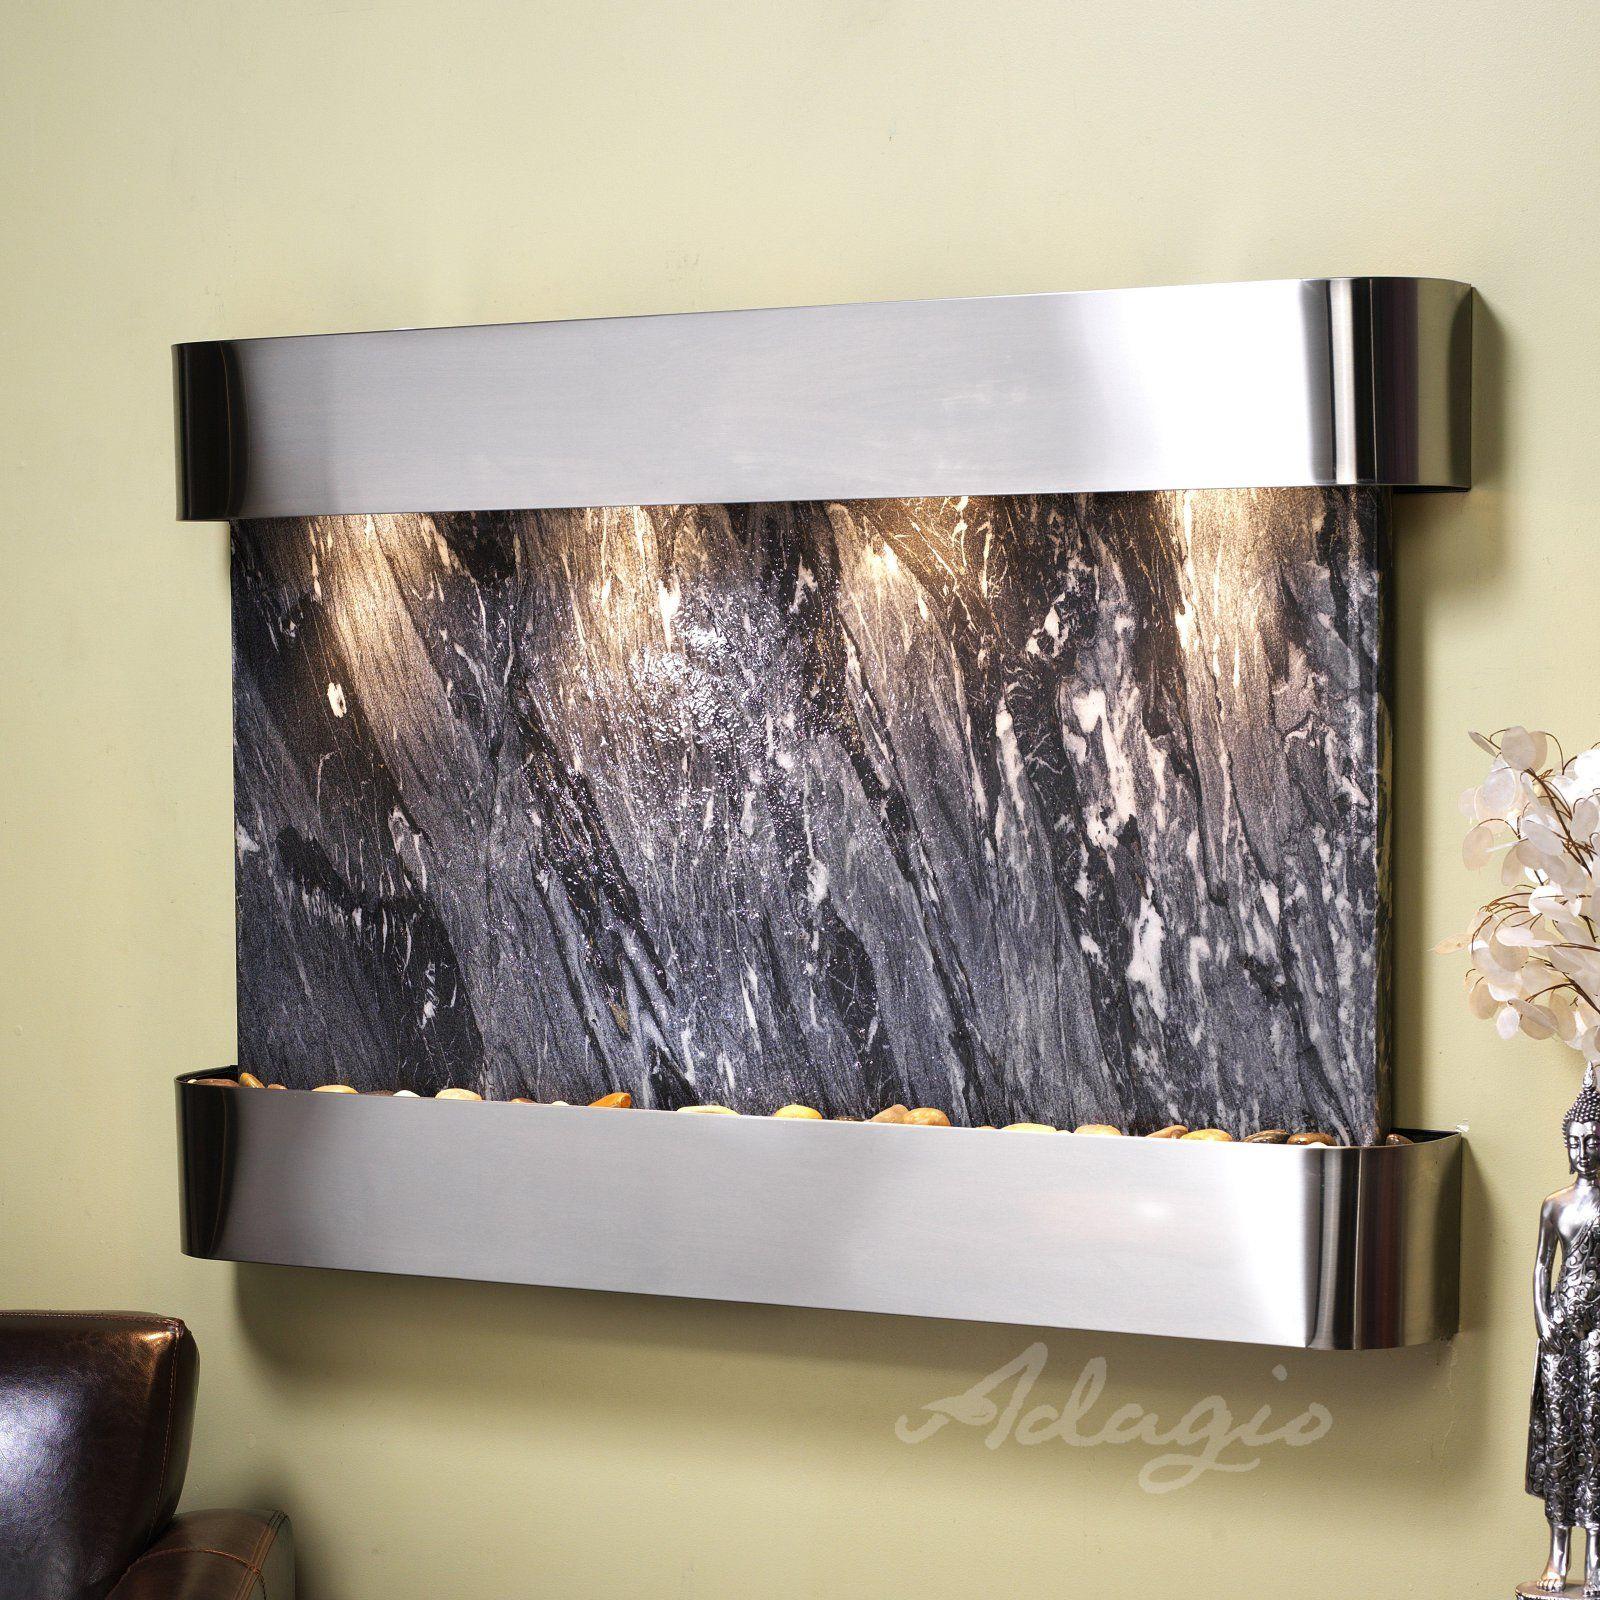 Wall Indoor Fountain Rajah Featherstone